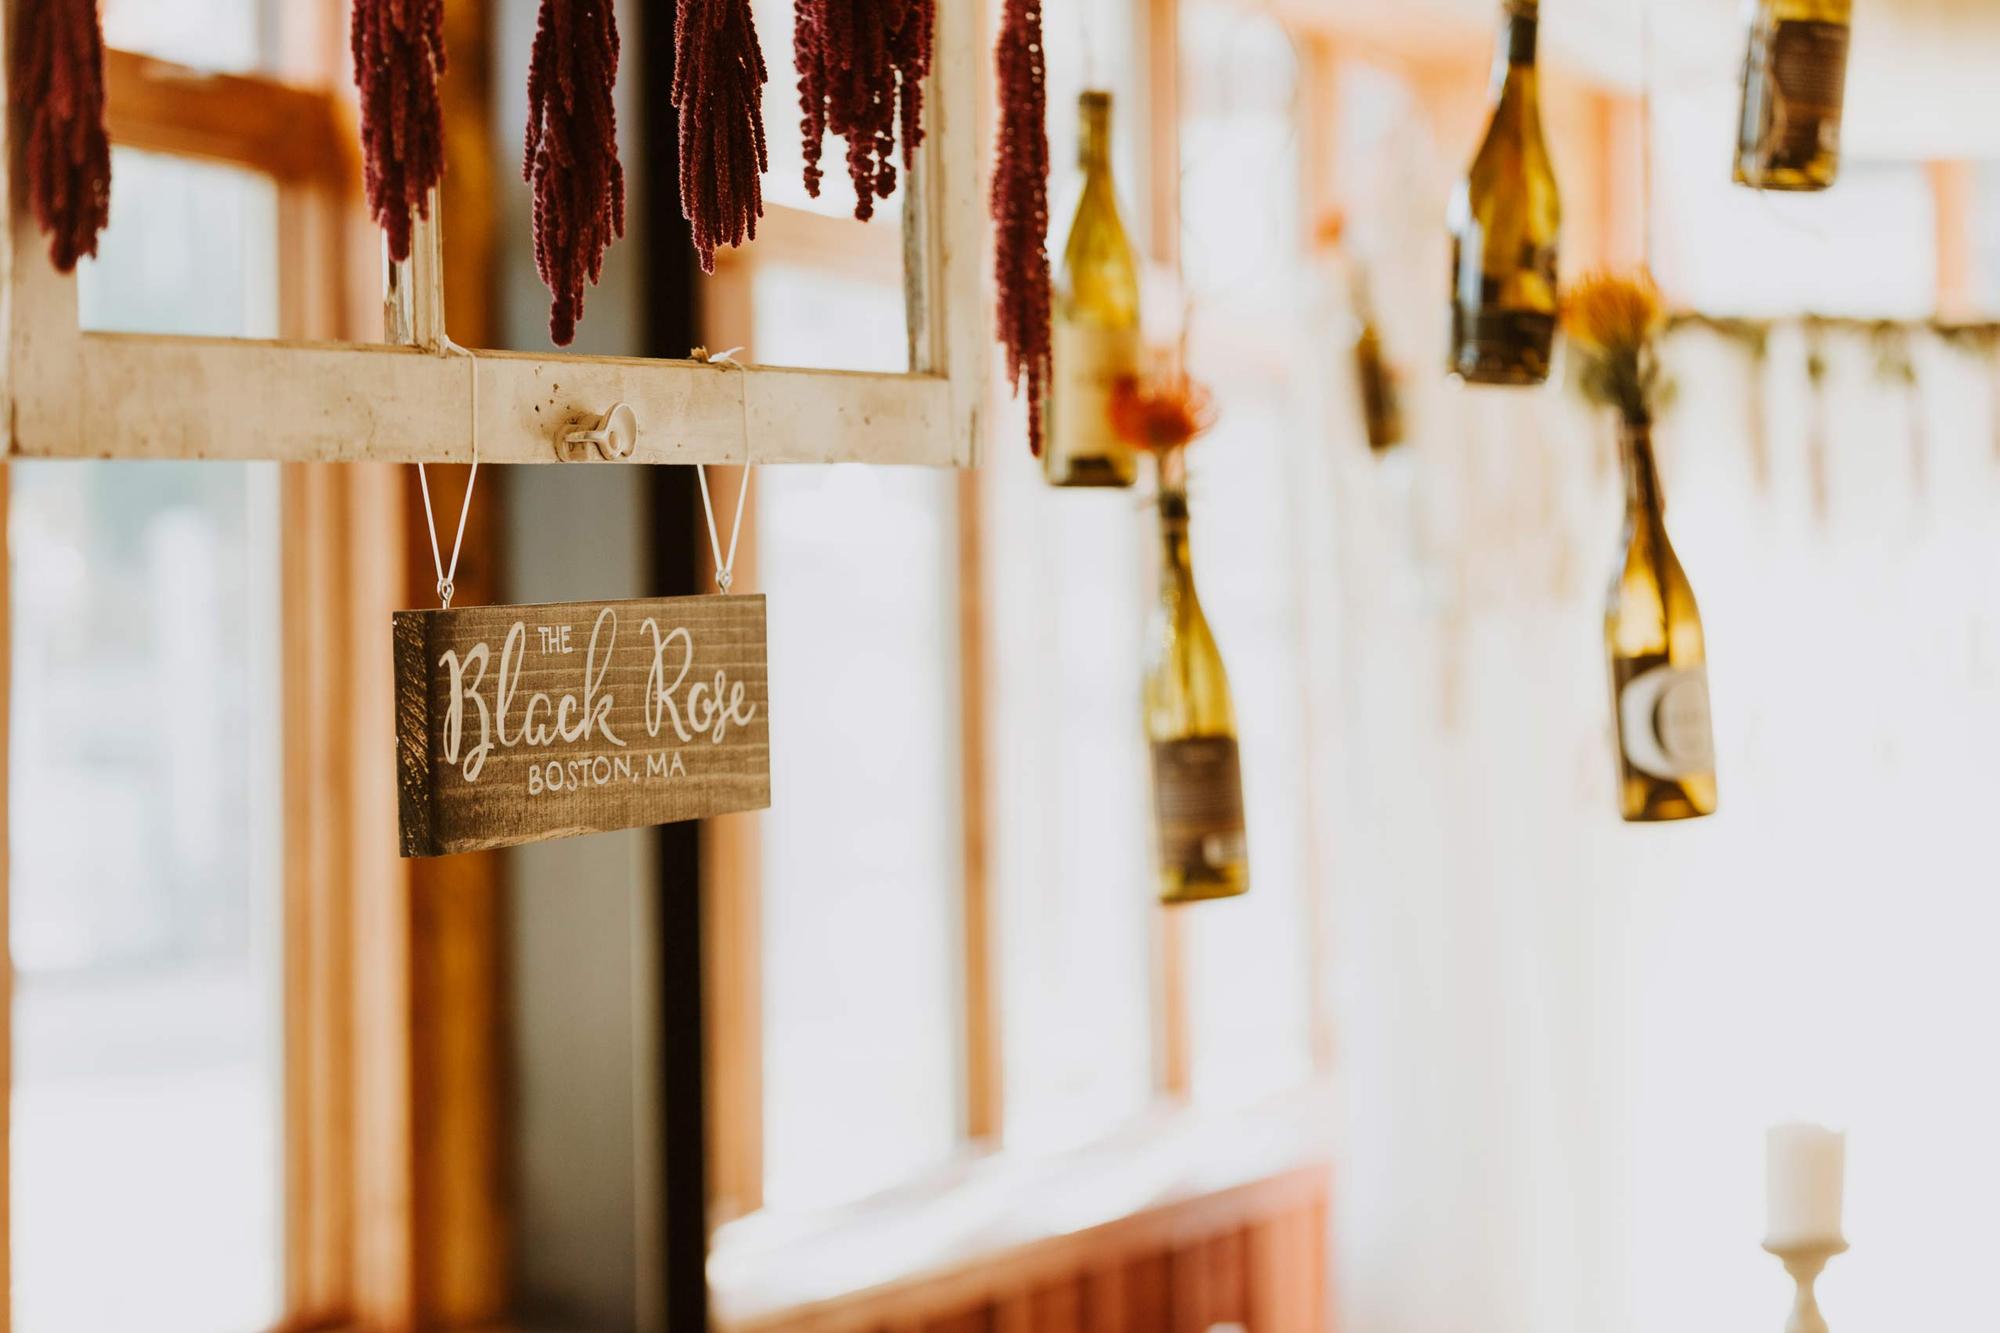 Linnea_Chaz_Red_Pine_Lodge_The_Canyons_Park_City_Frames_Wine_Bottle_Decor.jpg